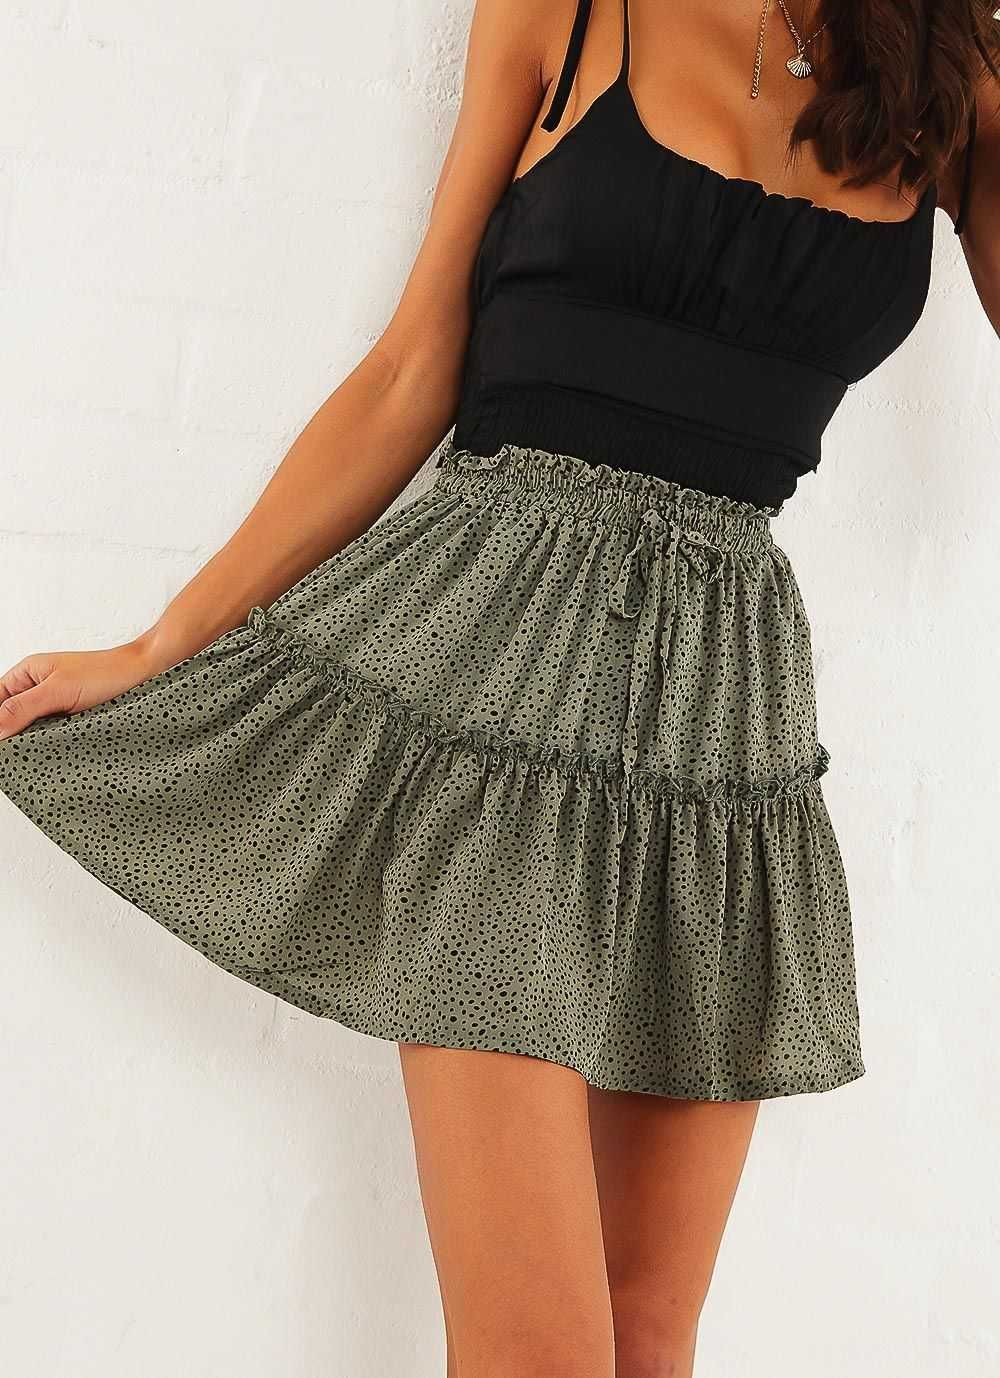 Classic Tie Front High Waisted Elastic Waist Ruffle Skirt